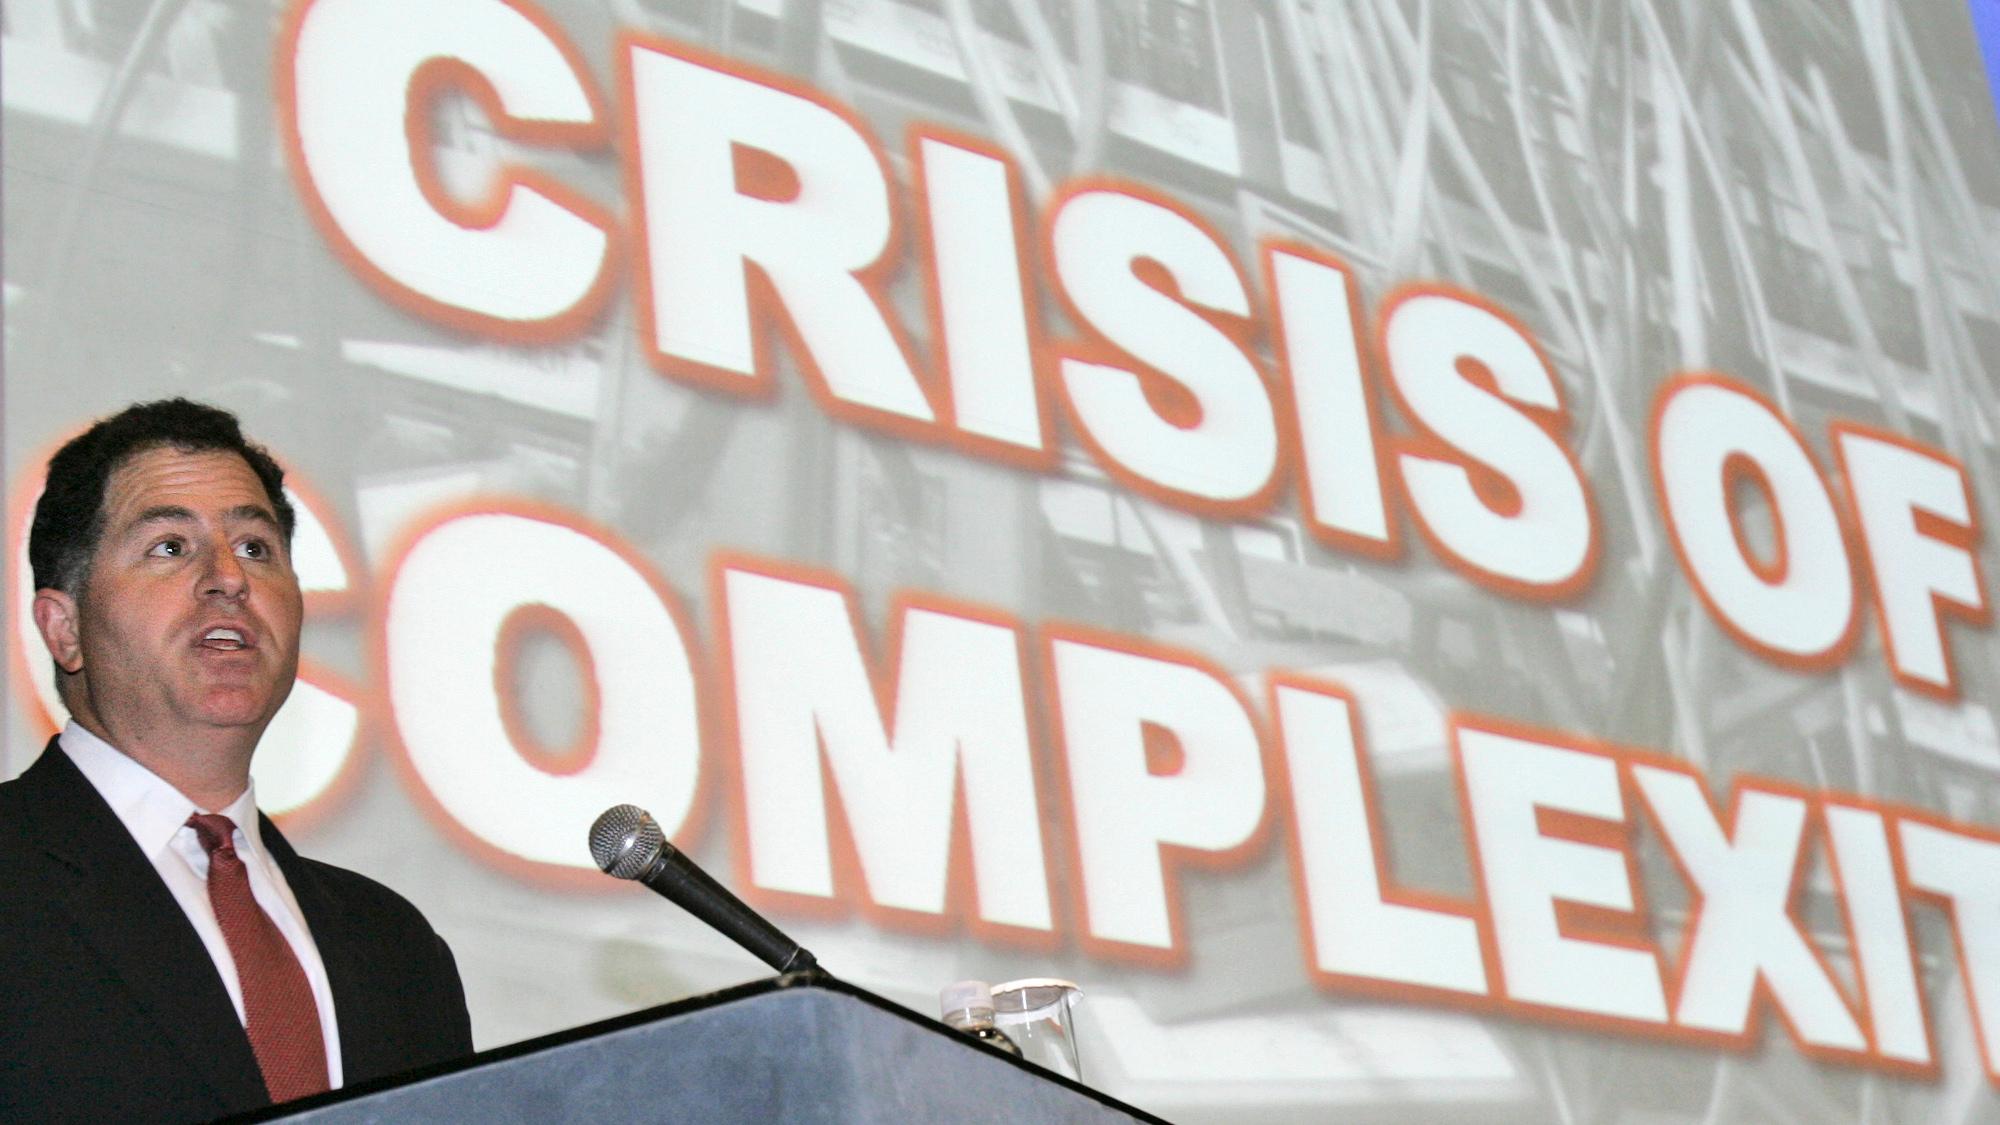 Michael Dell speaks to the press in Seoul, Korea in 2008.